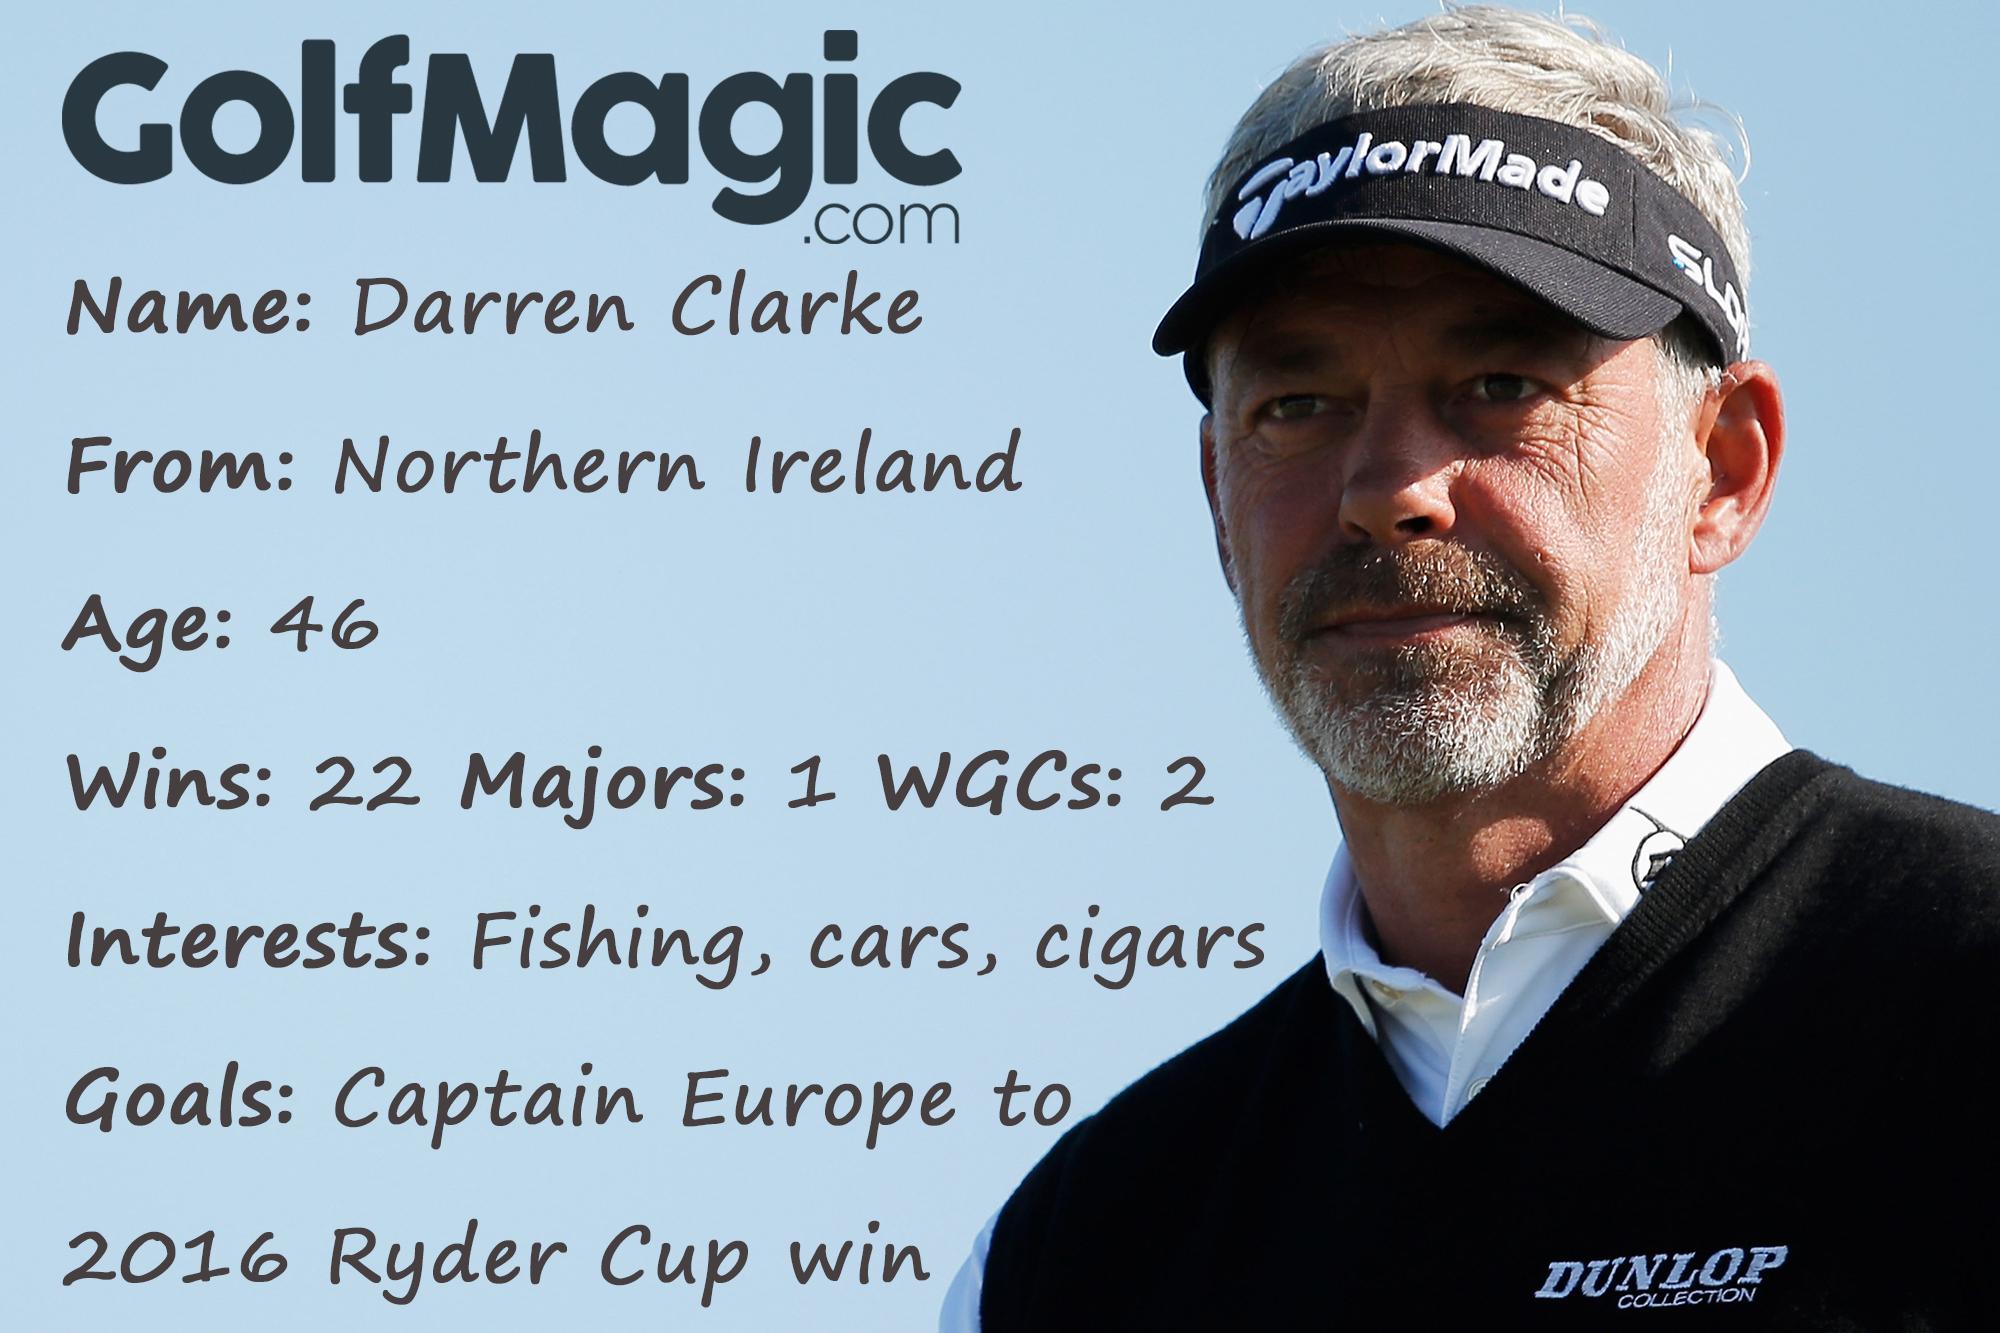 Darren Clarke has been named 2016 European Ryder Cup captain (Photo: Getty Images)